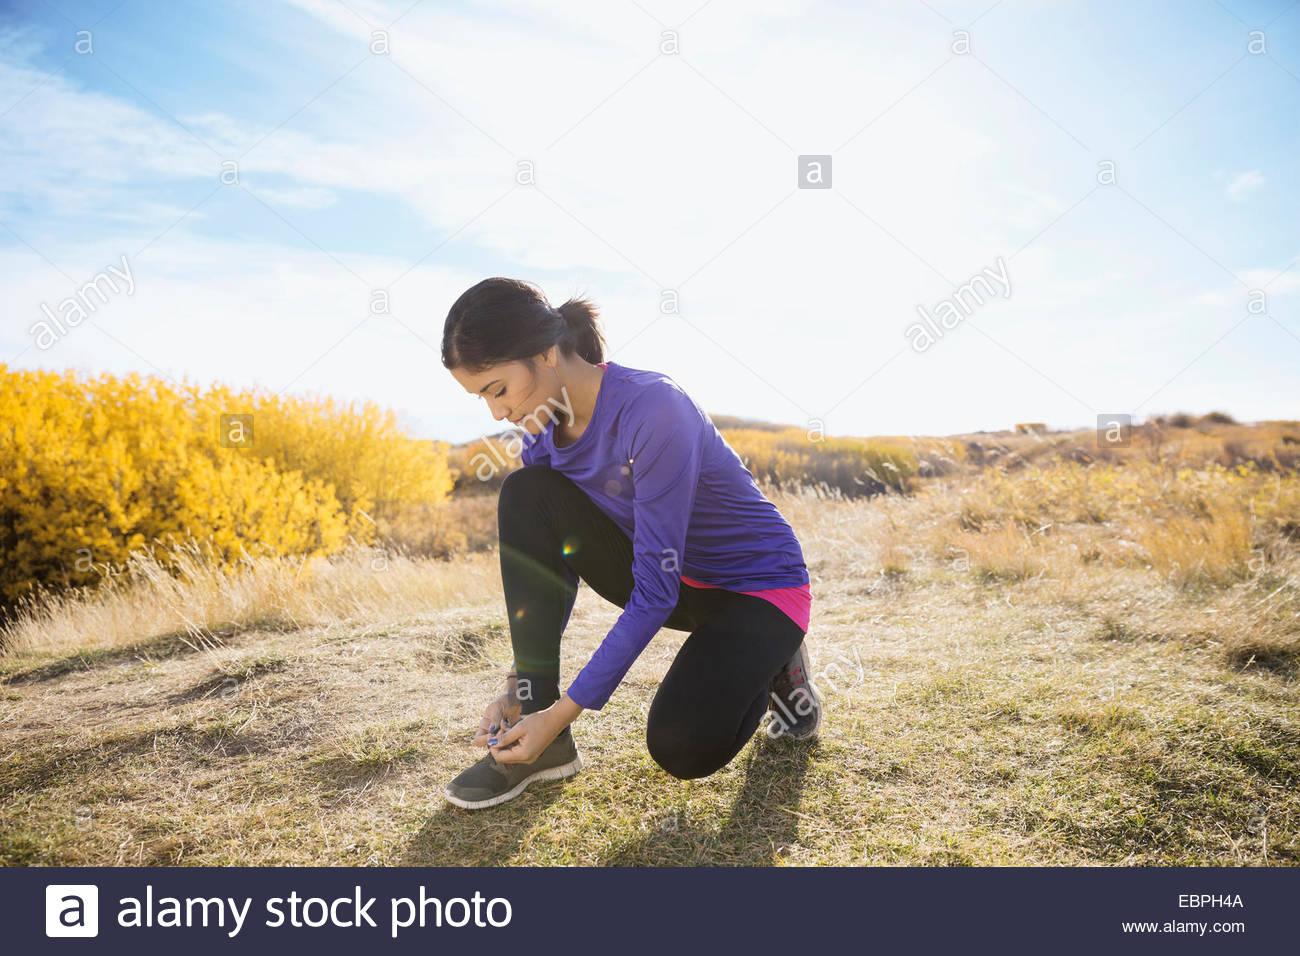 Runner chaussure de liage à sunny rural field Photo Stock